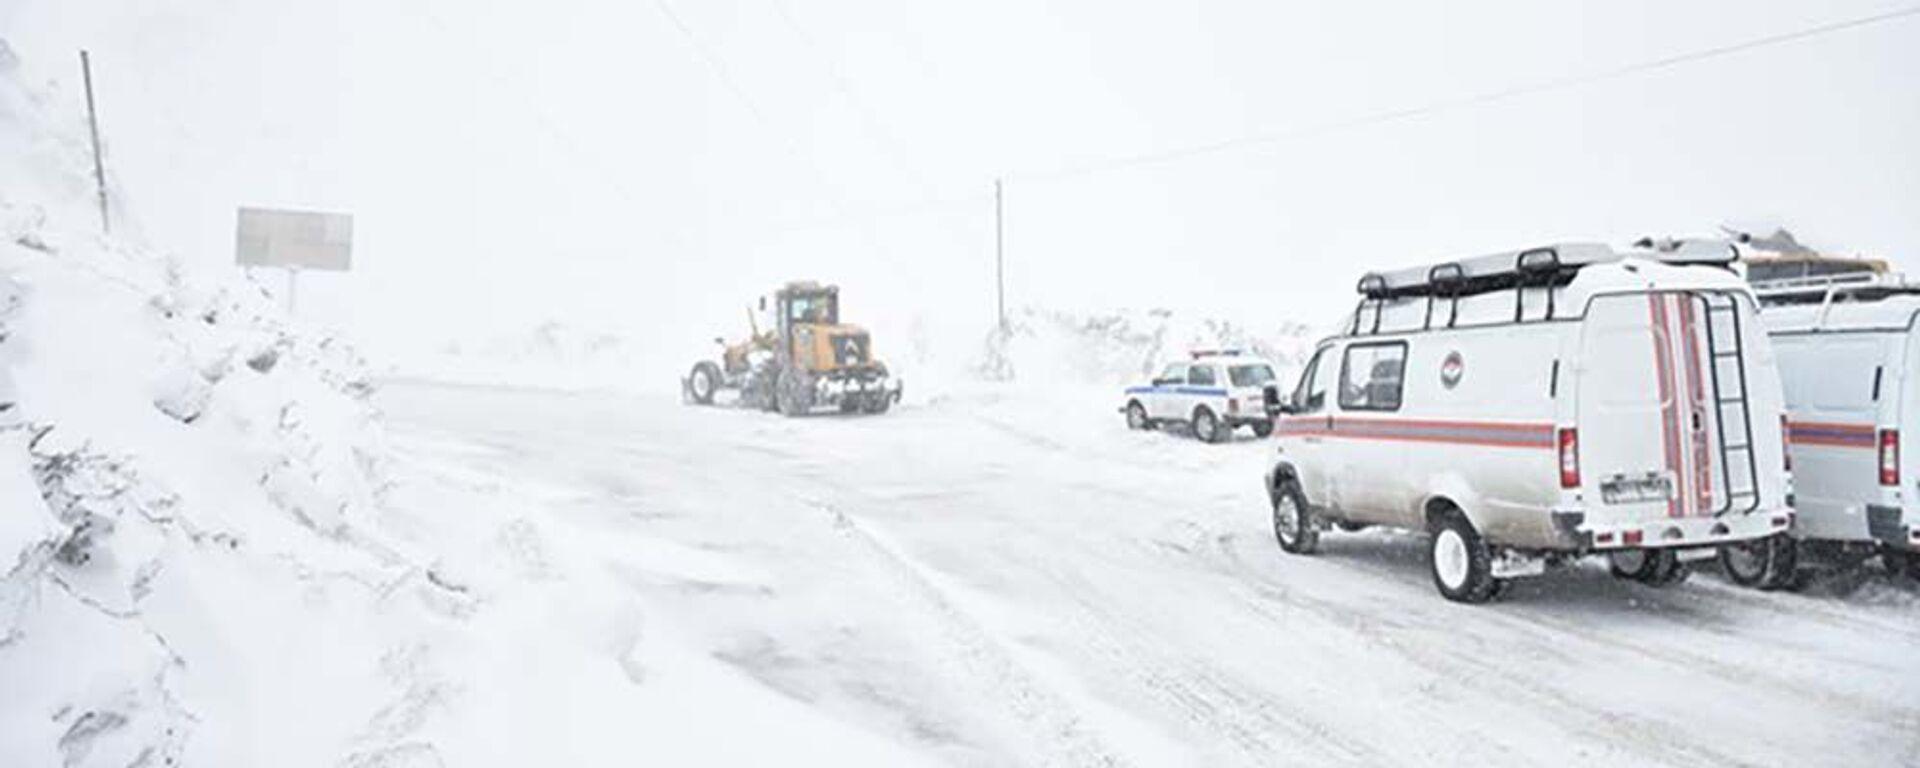 Занесенные снегом дороги в Таджикистане - Sputnik Таджикистан, 1920, 30.01.2021